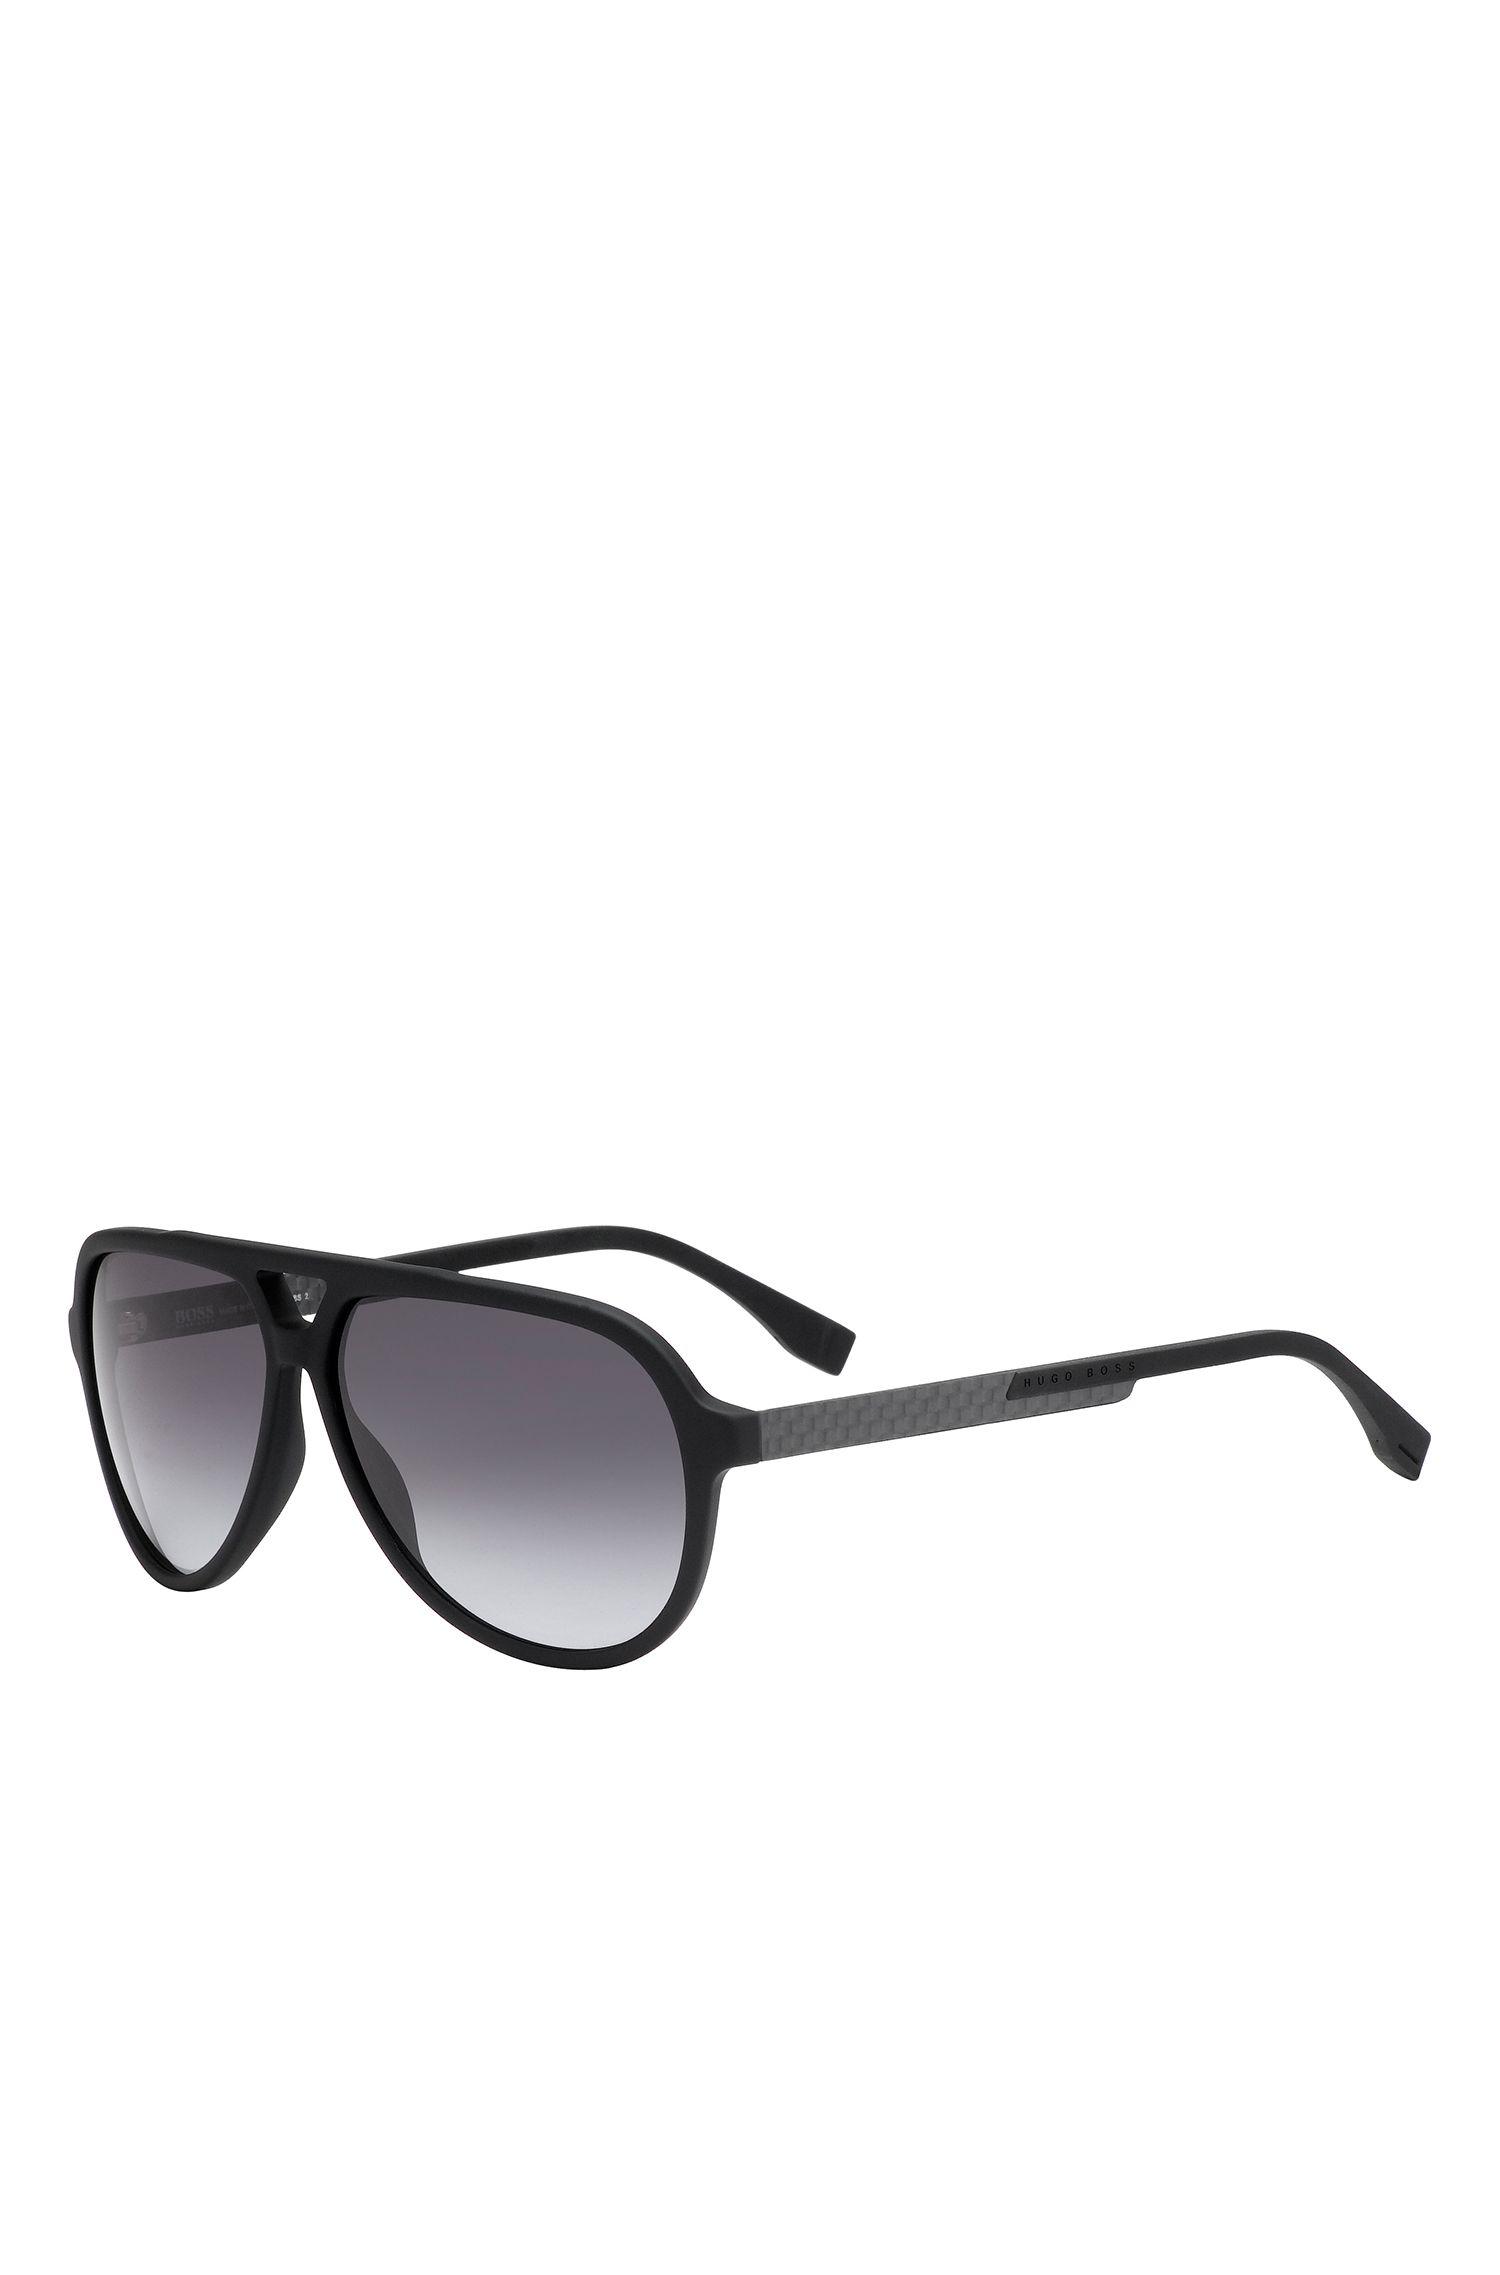 'BOSS 0731S' | Gray Lens Carbon Fiber Aviator Sunglasses